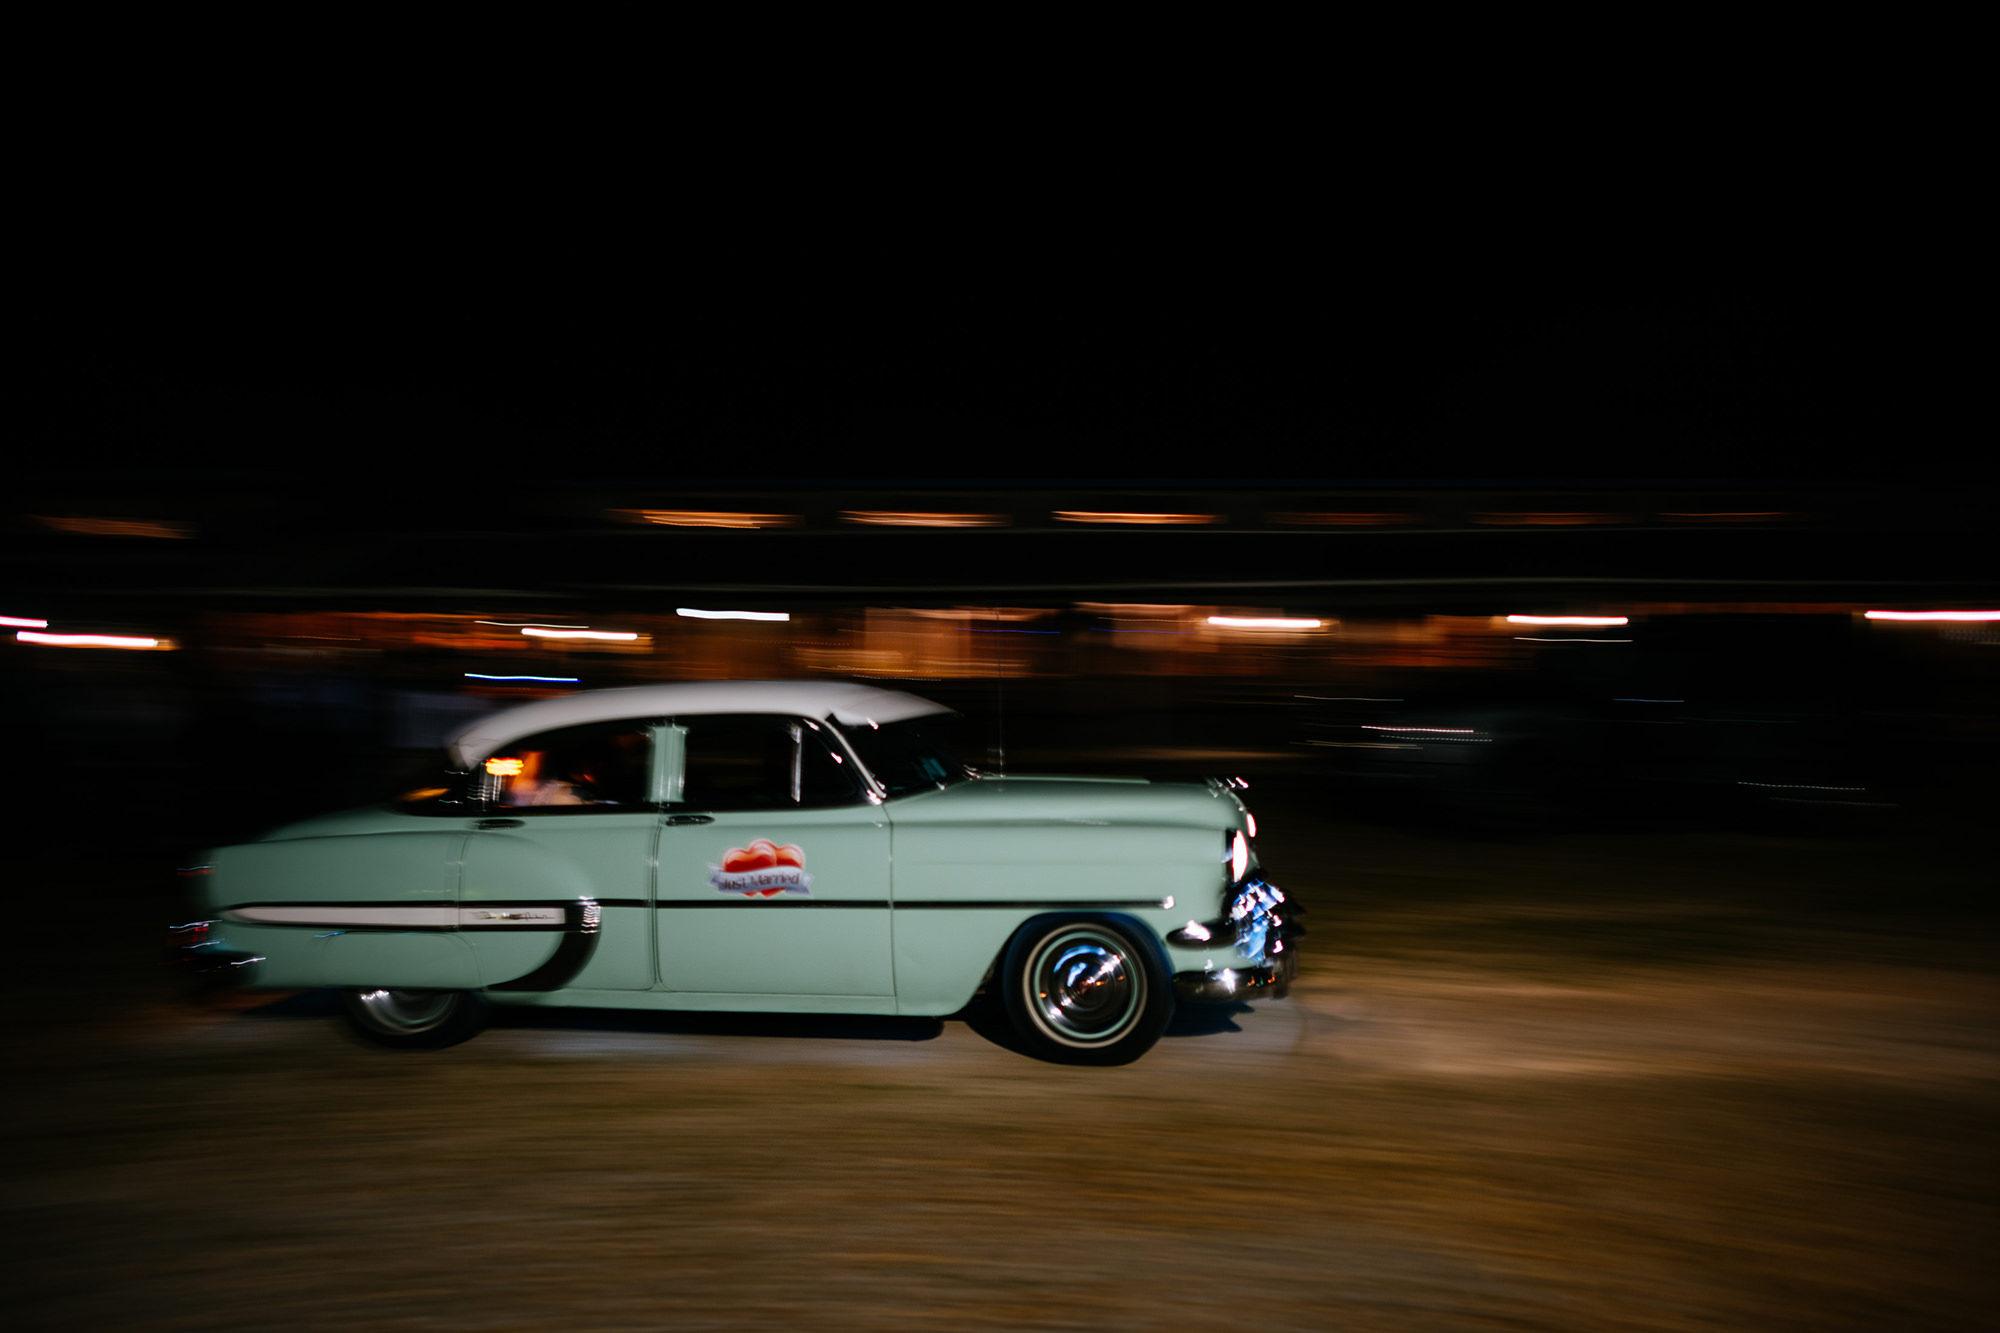 car leaving wedding